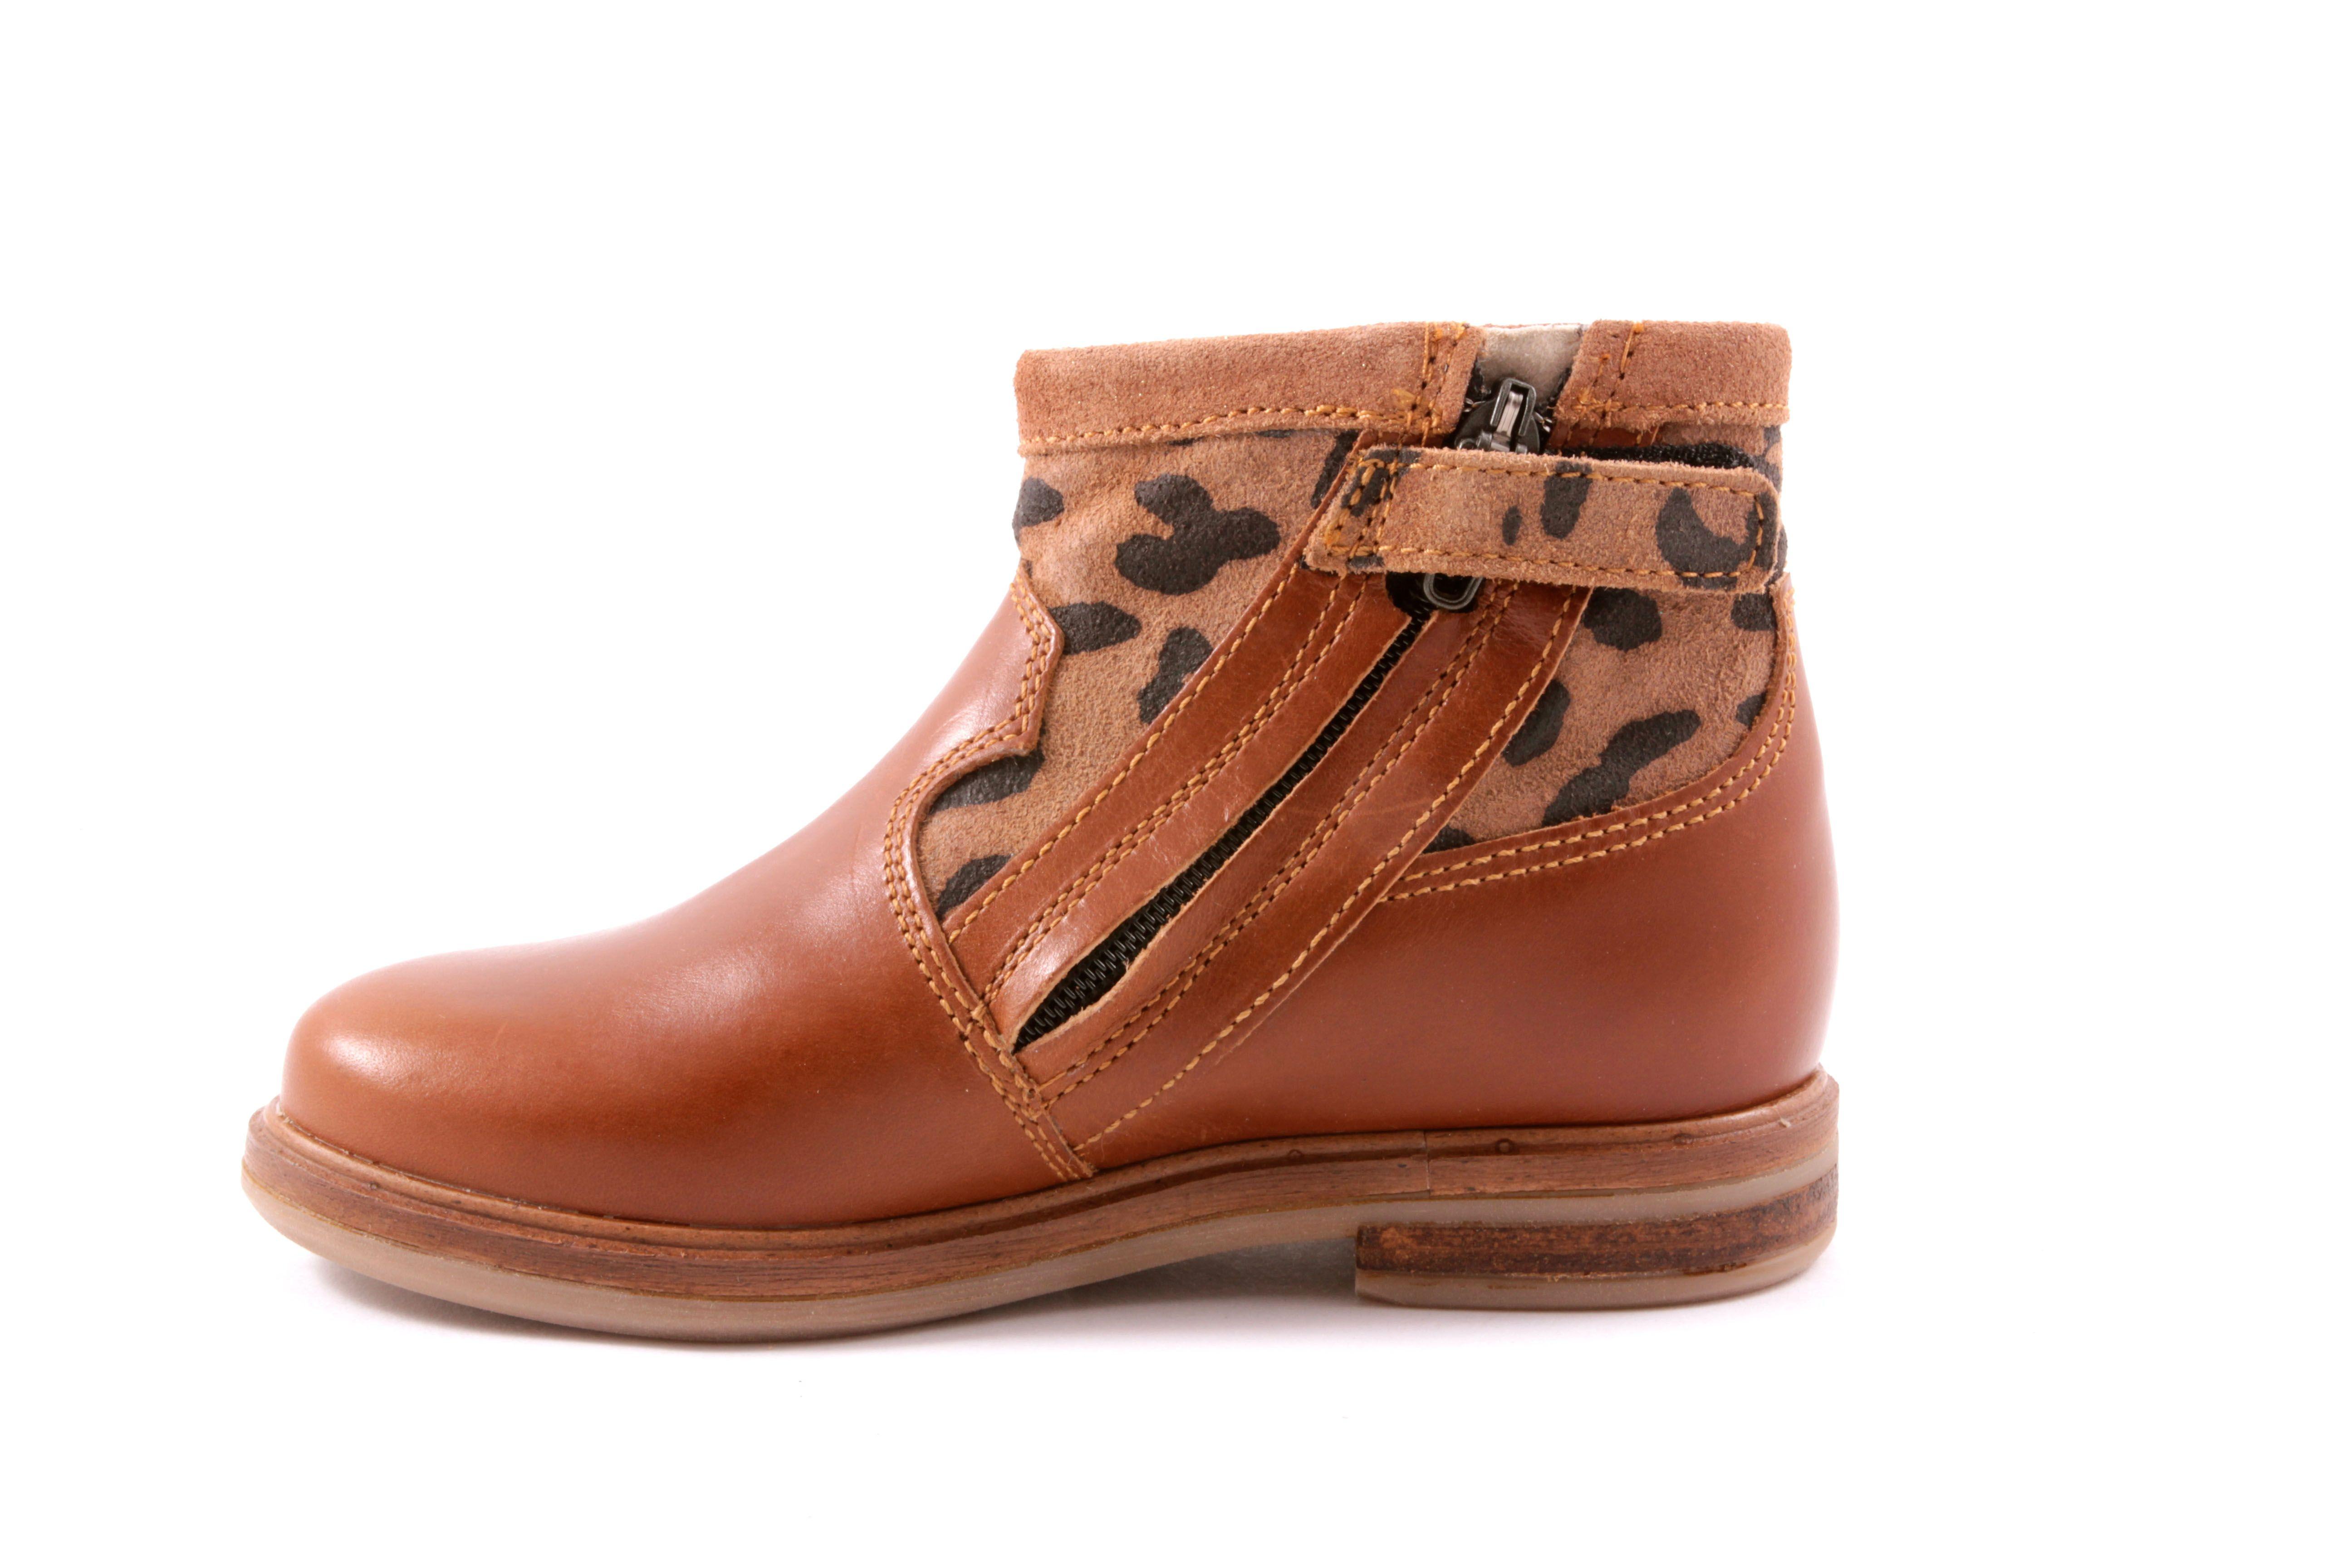 678d40195bb Kinderschoenen online - Pom d'api laars leopard cognac | Kids ...